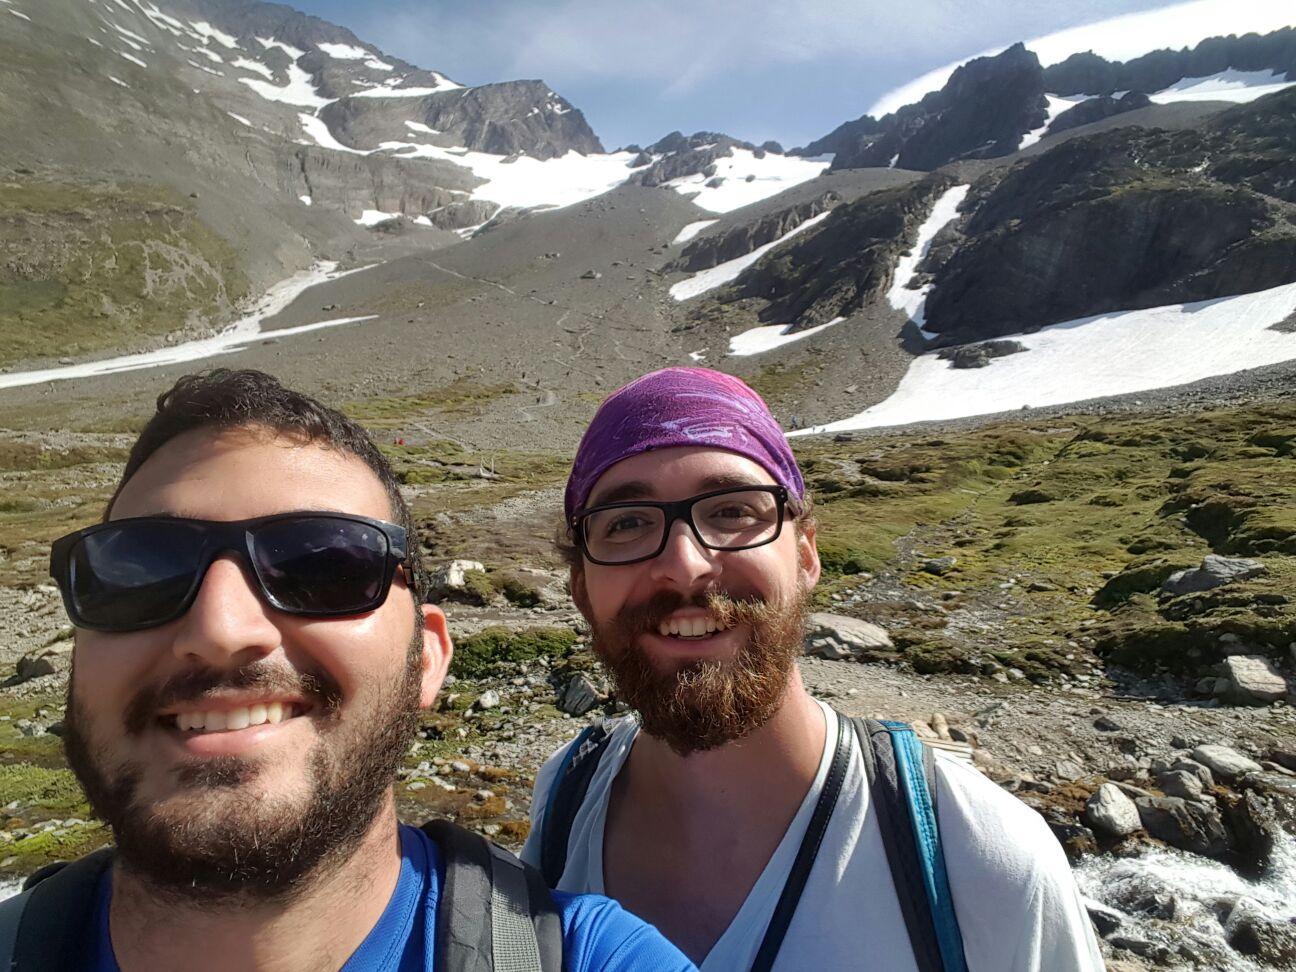 Halabi and I at the glacier. I think I need a shave.